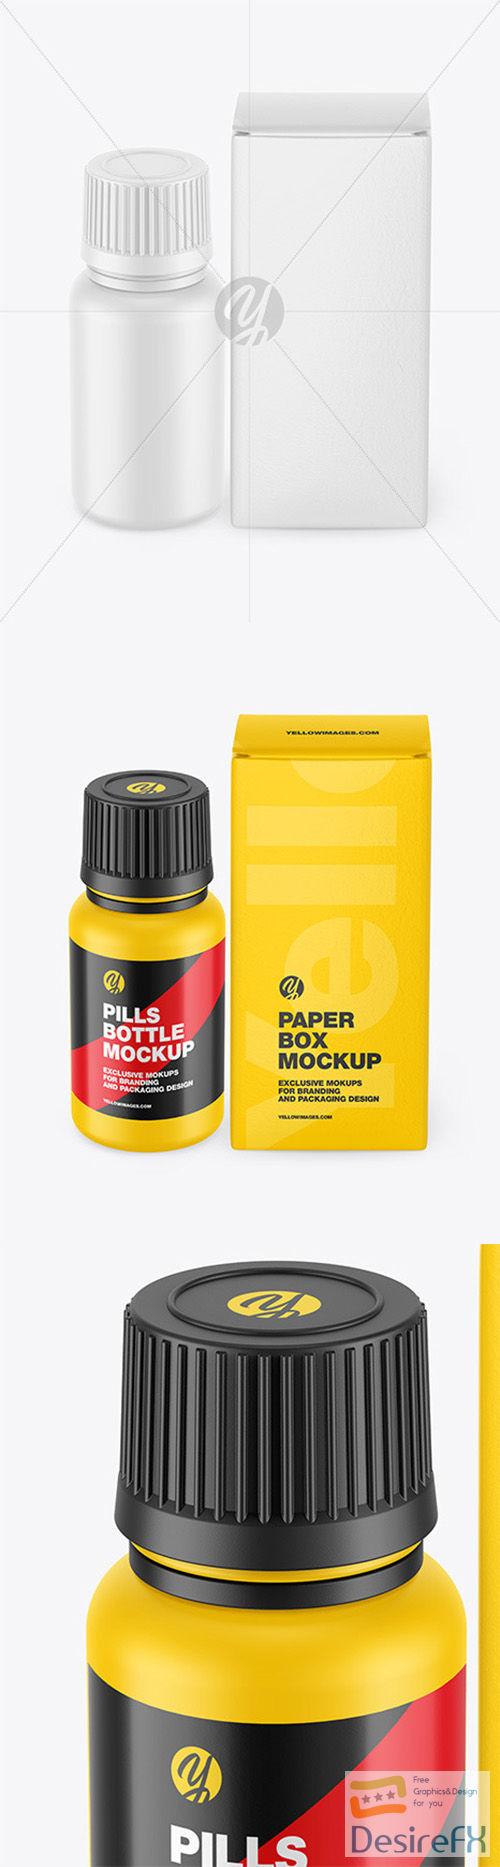 Matte Pills Bottle W/ Paper Box Mockup 66398